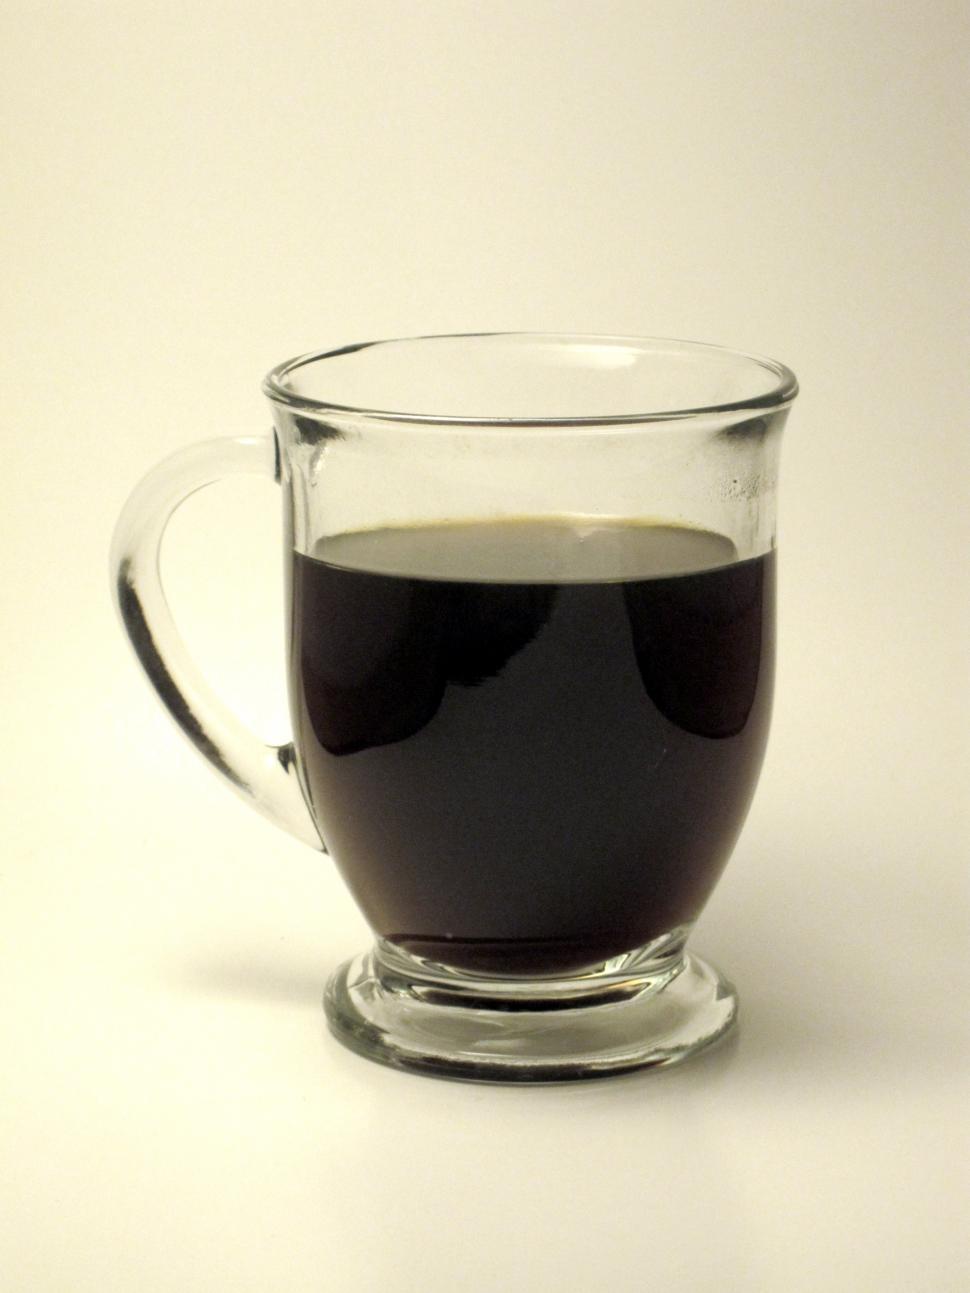 Download Free Stock Photo of Coffee Mug